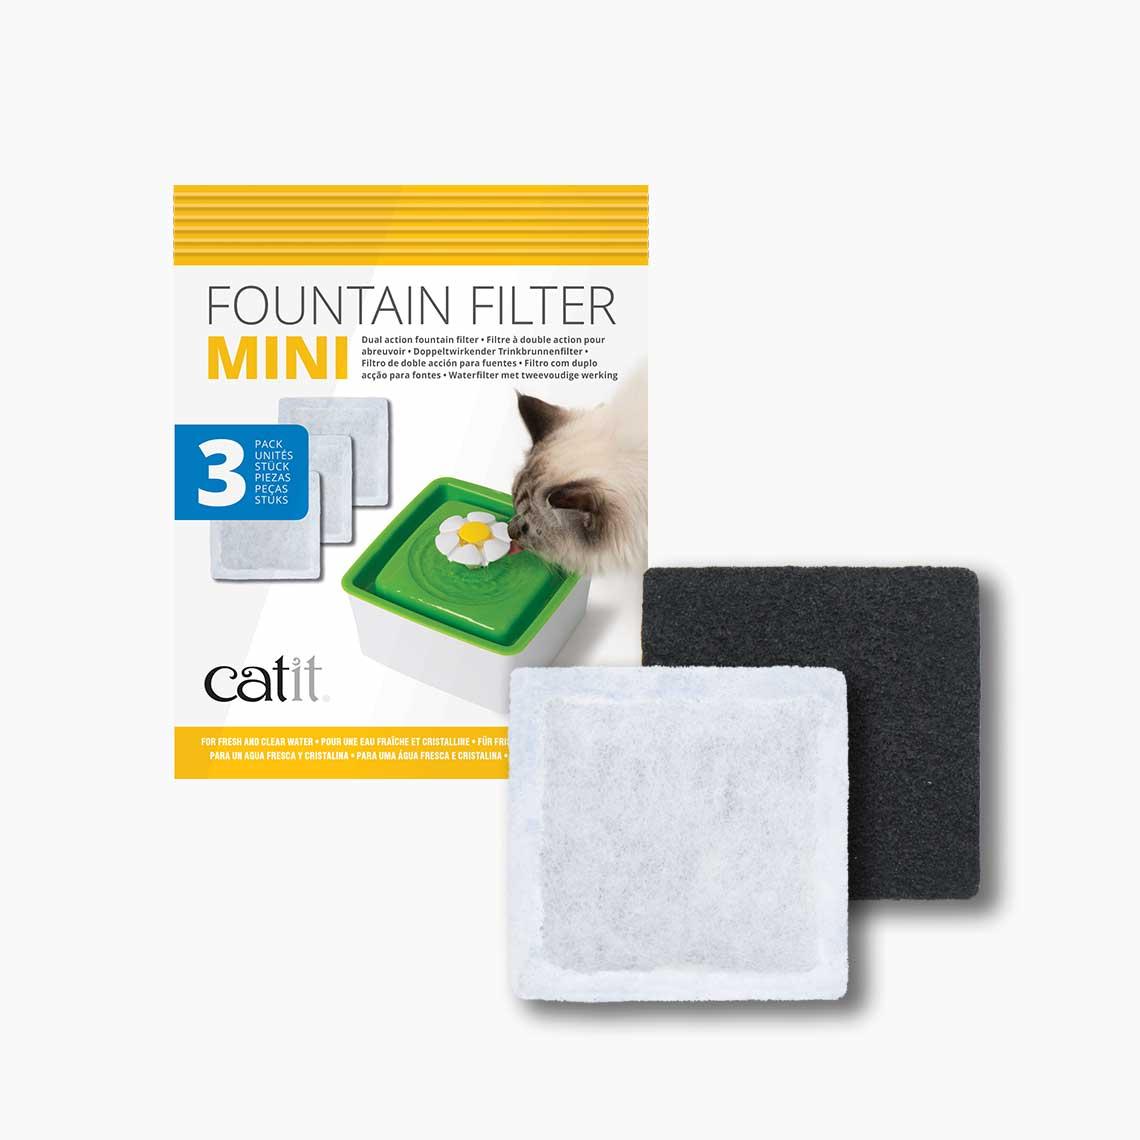 Catit Mini Fountain Filter, 3-pk